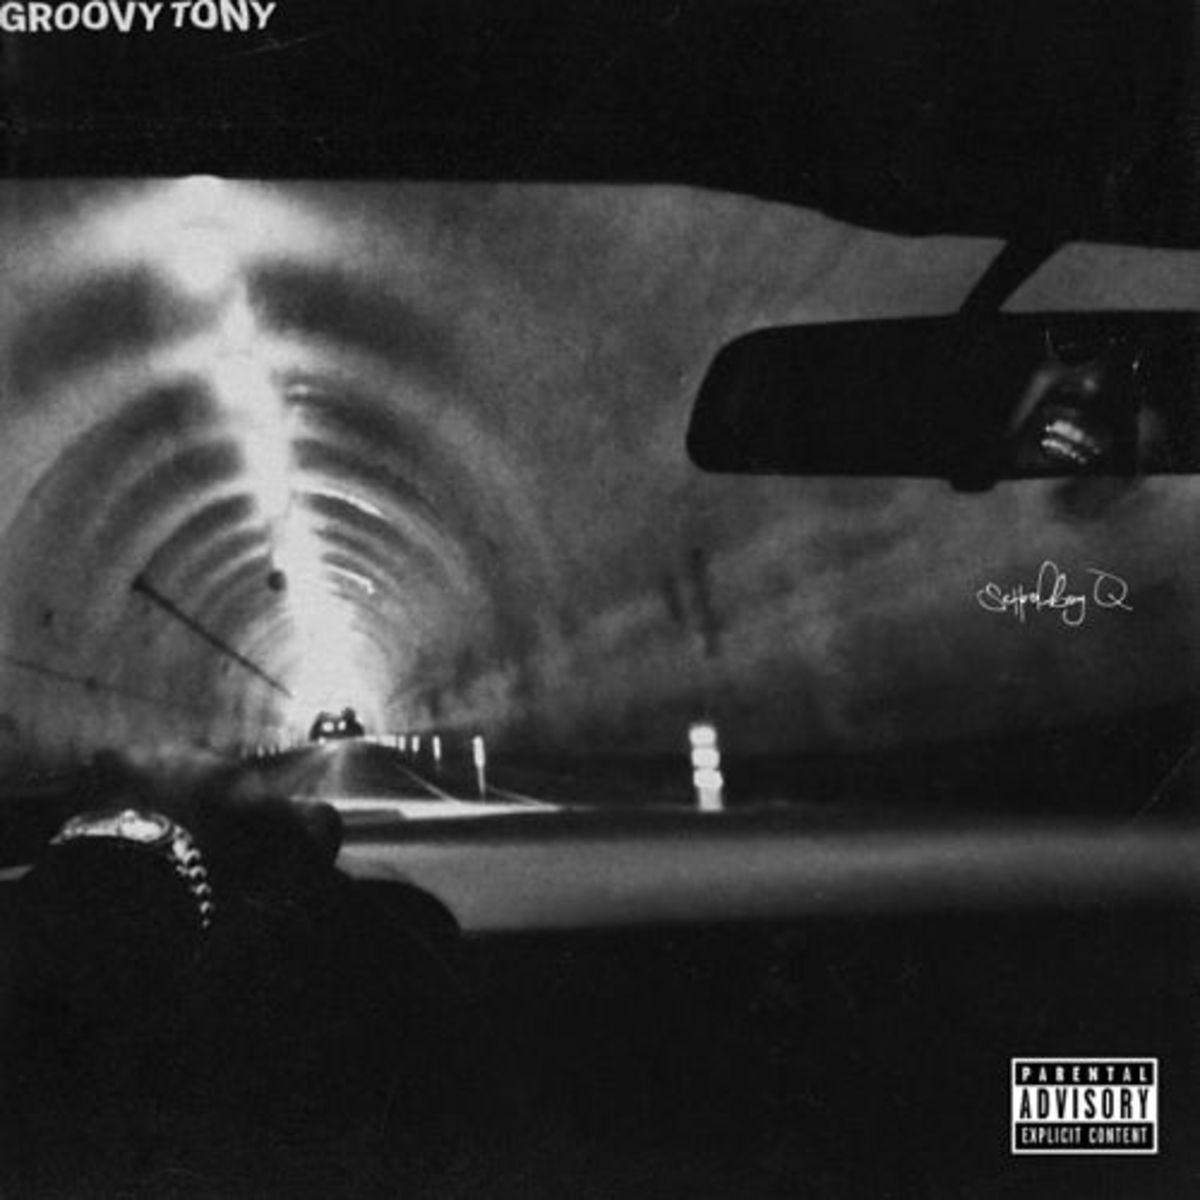 schoolboy-q-groovy-tony.jpg